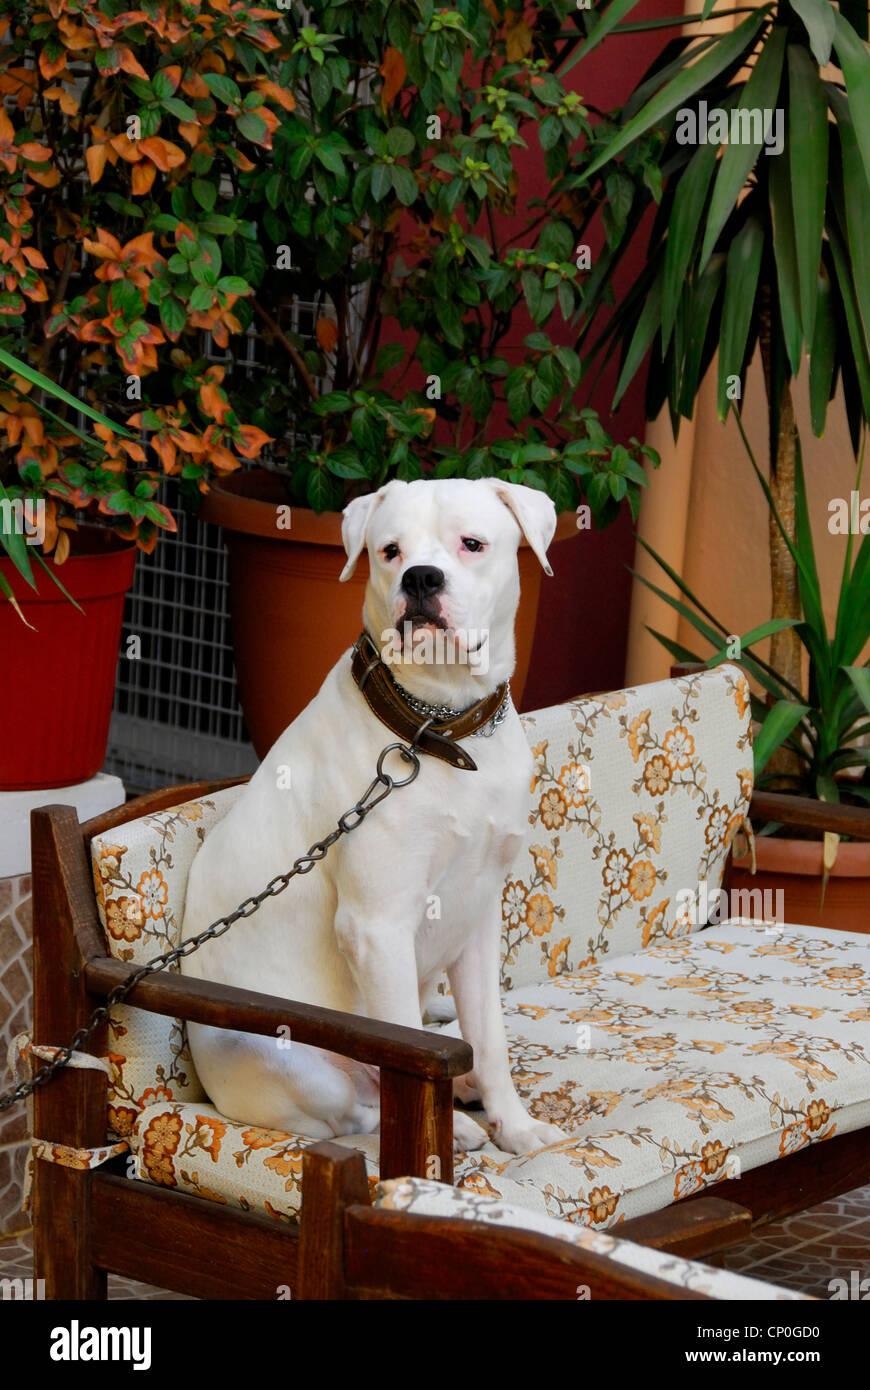 A white boxer dog..sitting comfortably. - Stock Image